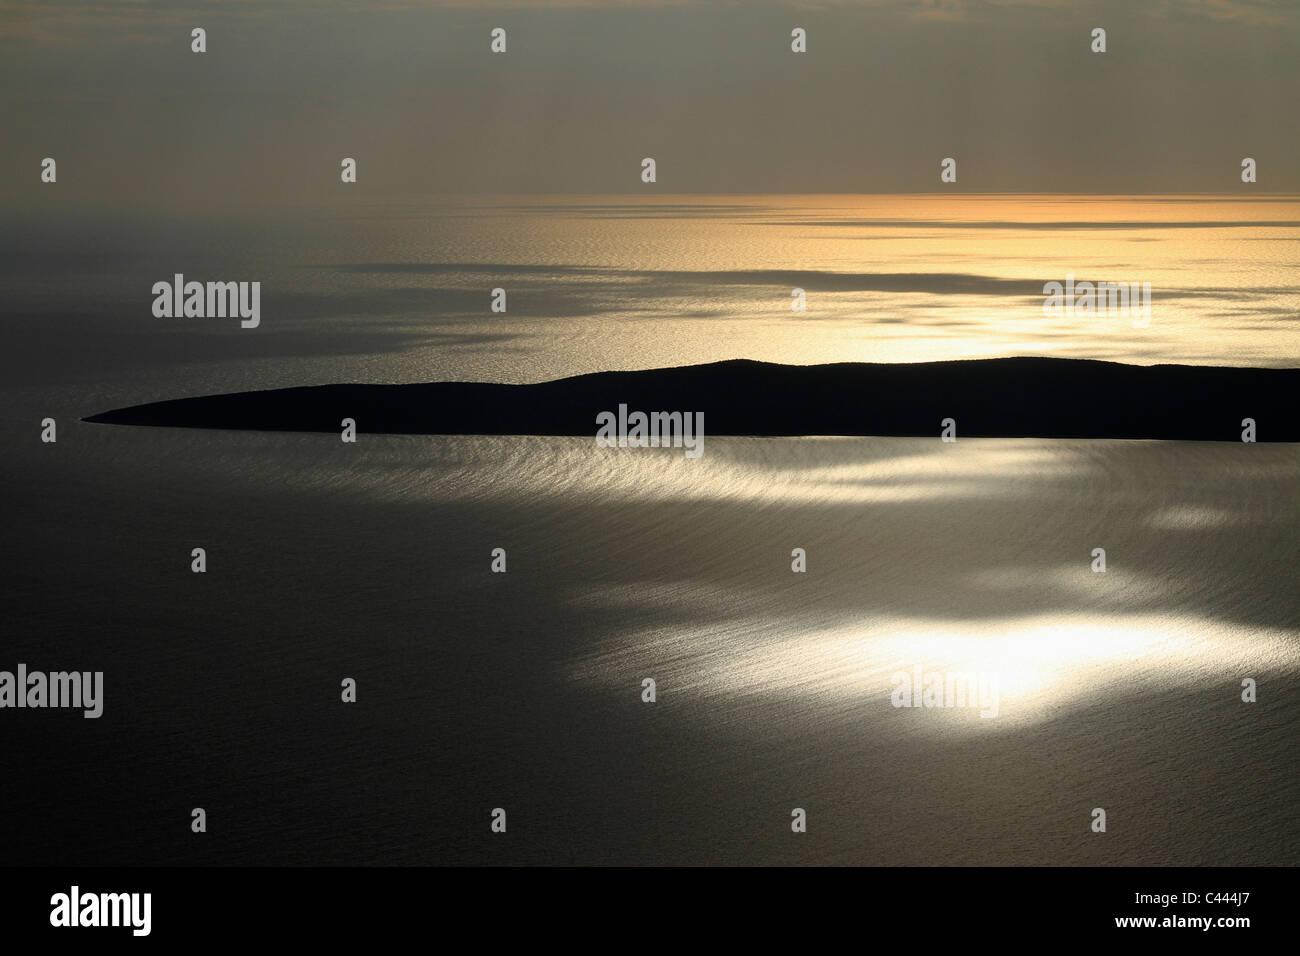 Sunrise on the Adriatic Sea near Unije, Croatia - Stock Image